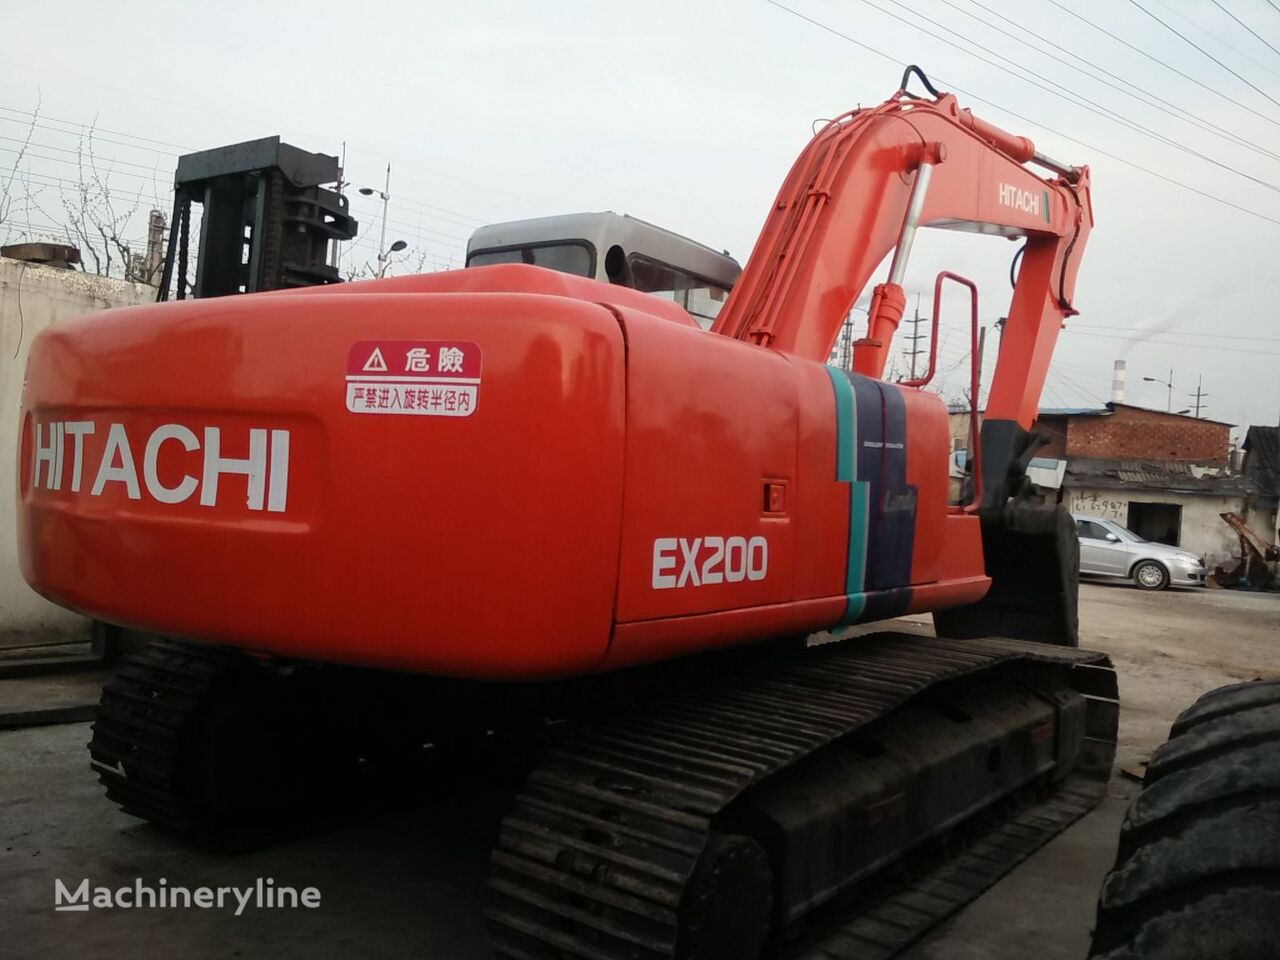 HITACHI EX200-2 tracked excavator